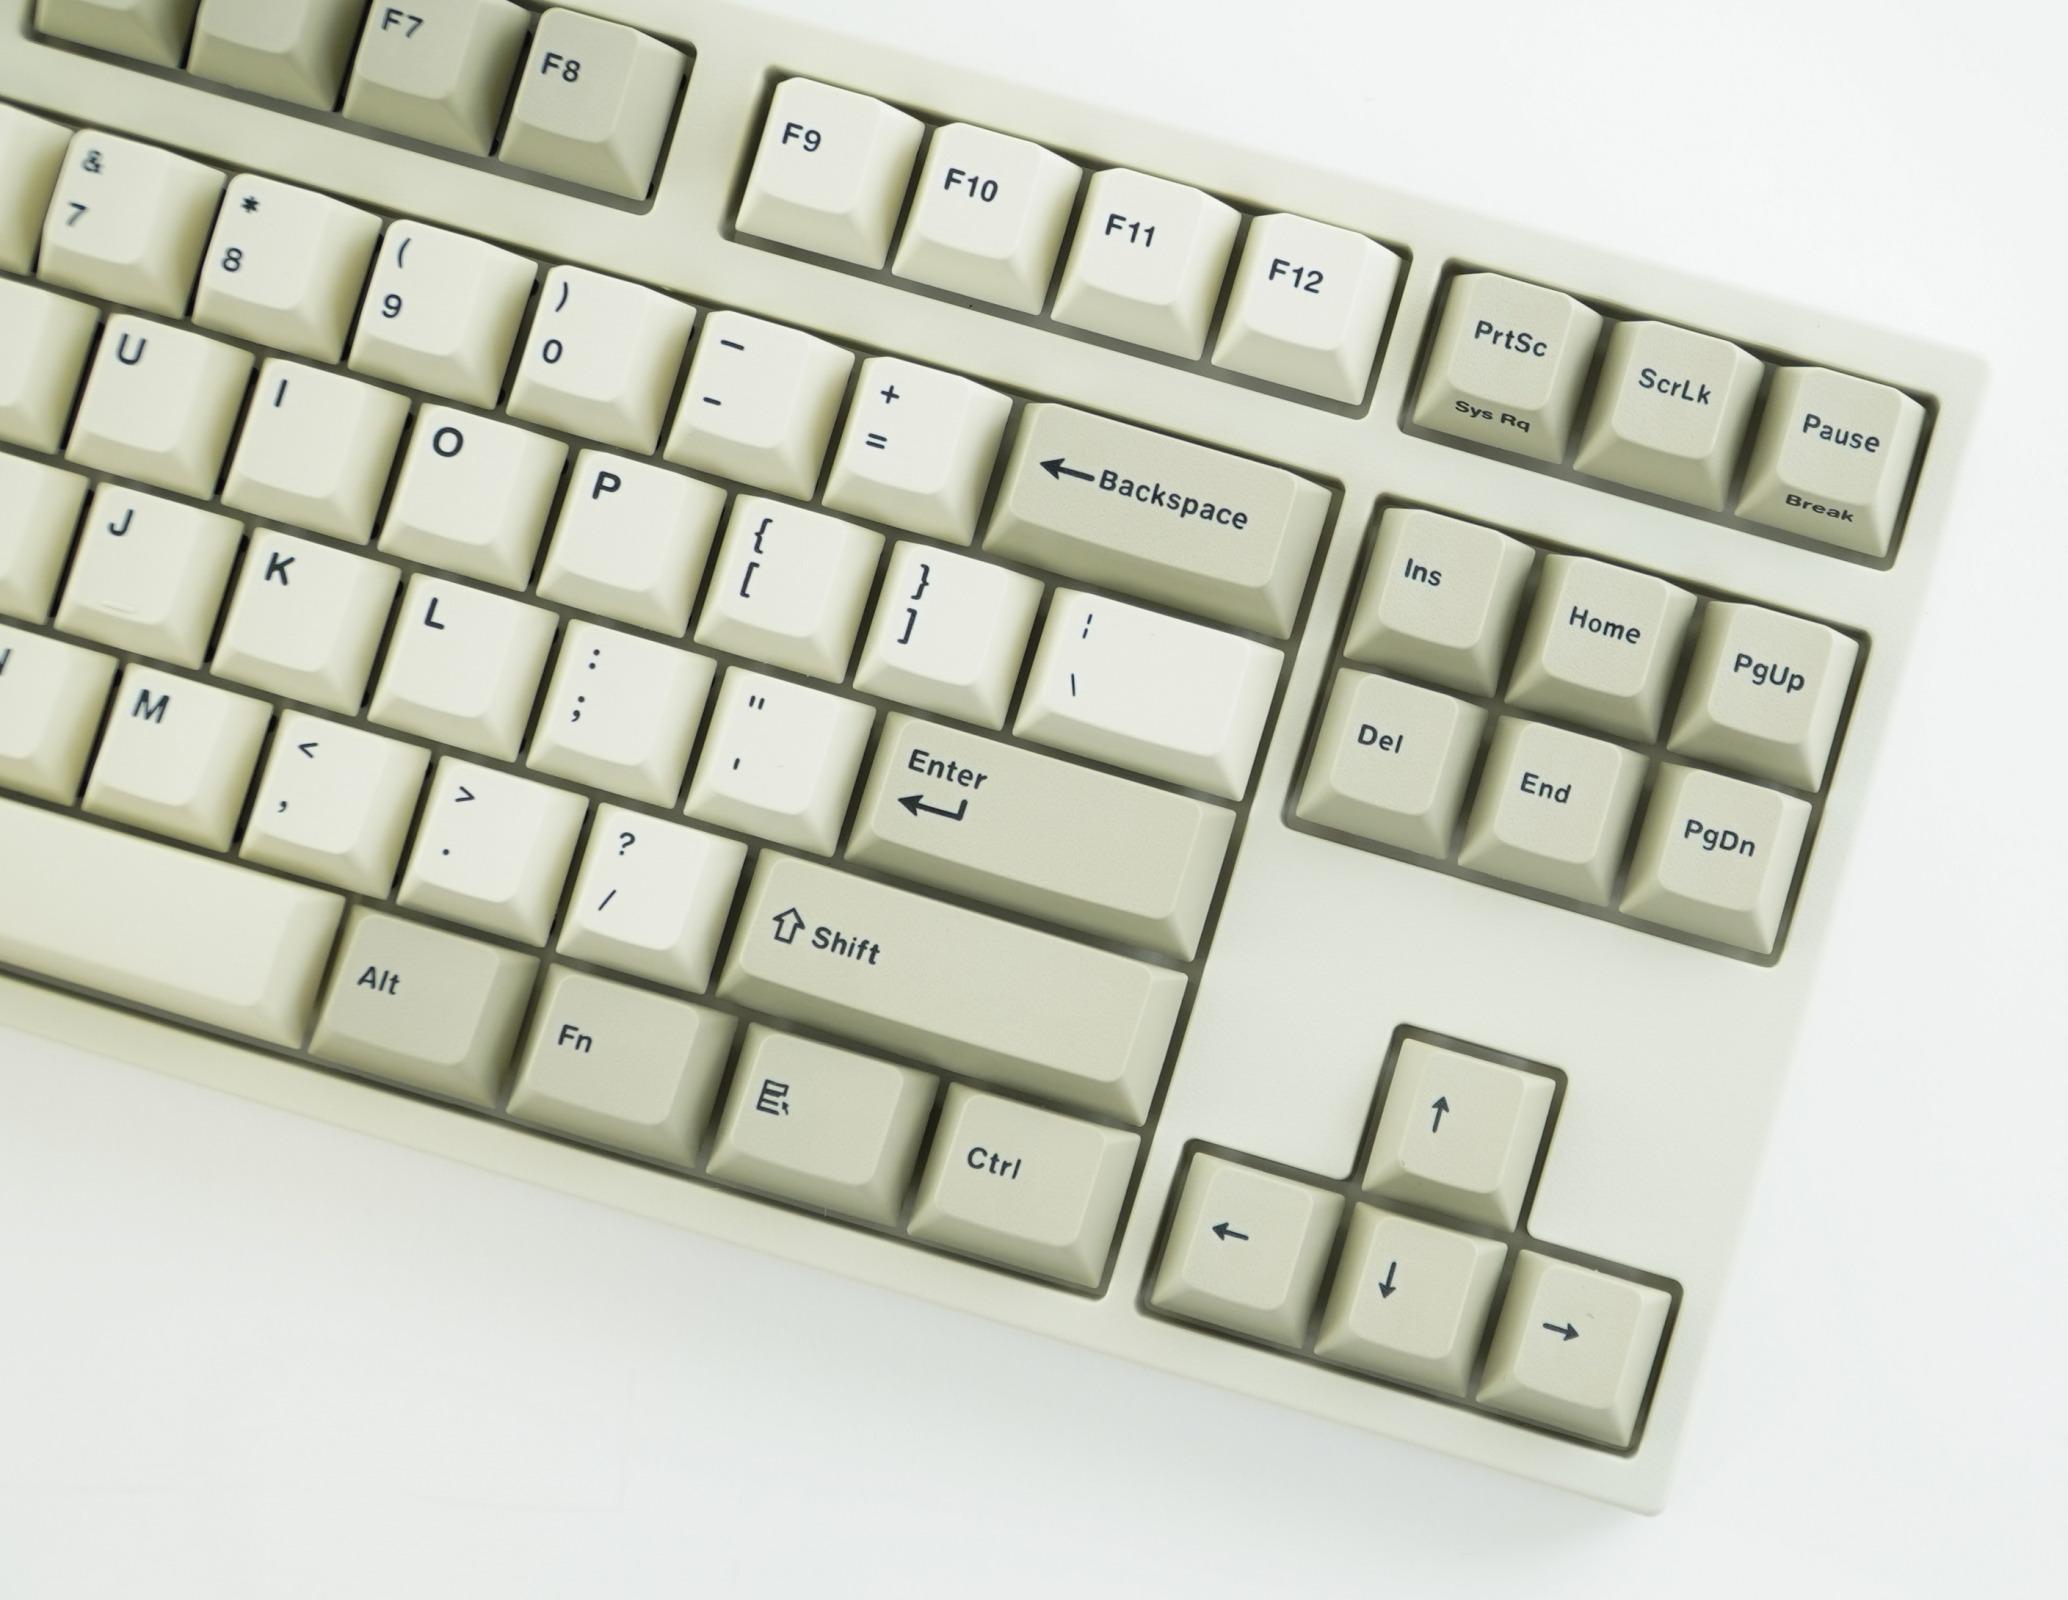 af4ec8d2c4b Leopold FC750R Two Tone White PD TKL Double Shot PBT Mechanical Keyboard